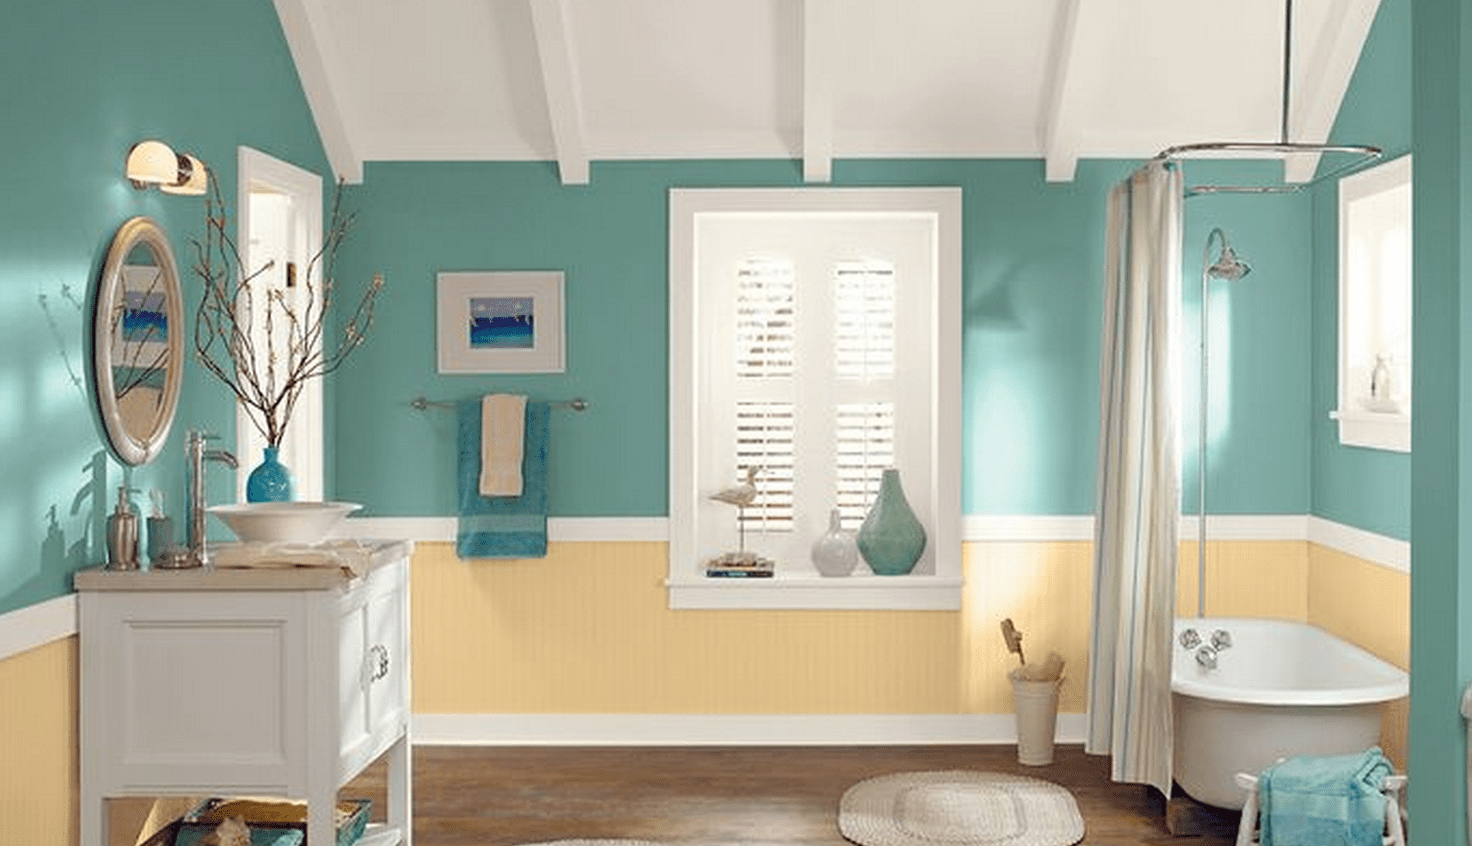 Best Kitchen Gallery: Interior House Painting of Bathroom Paint Design Ideas  on rachelxblog.com